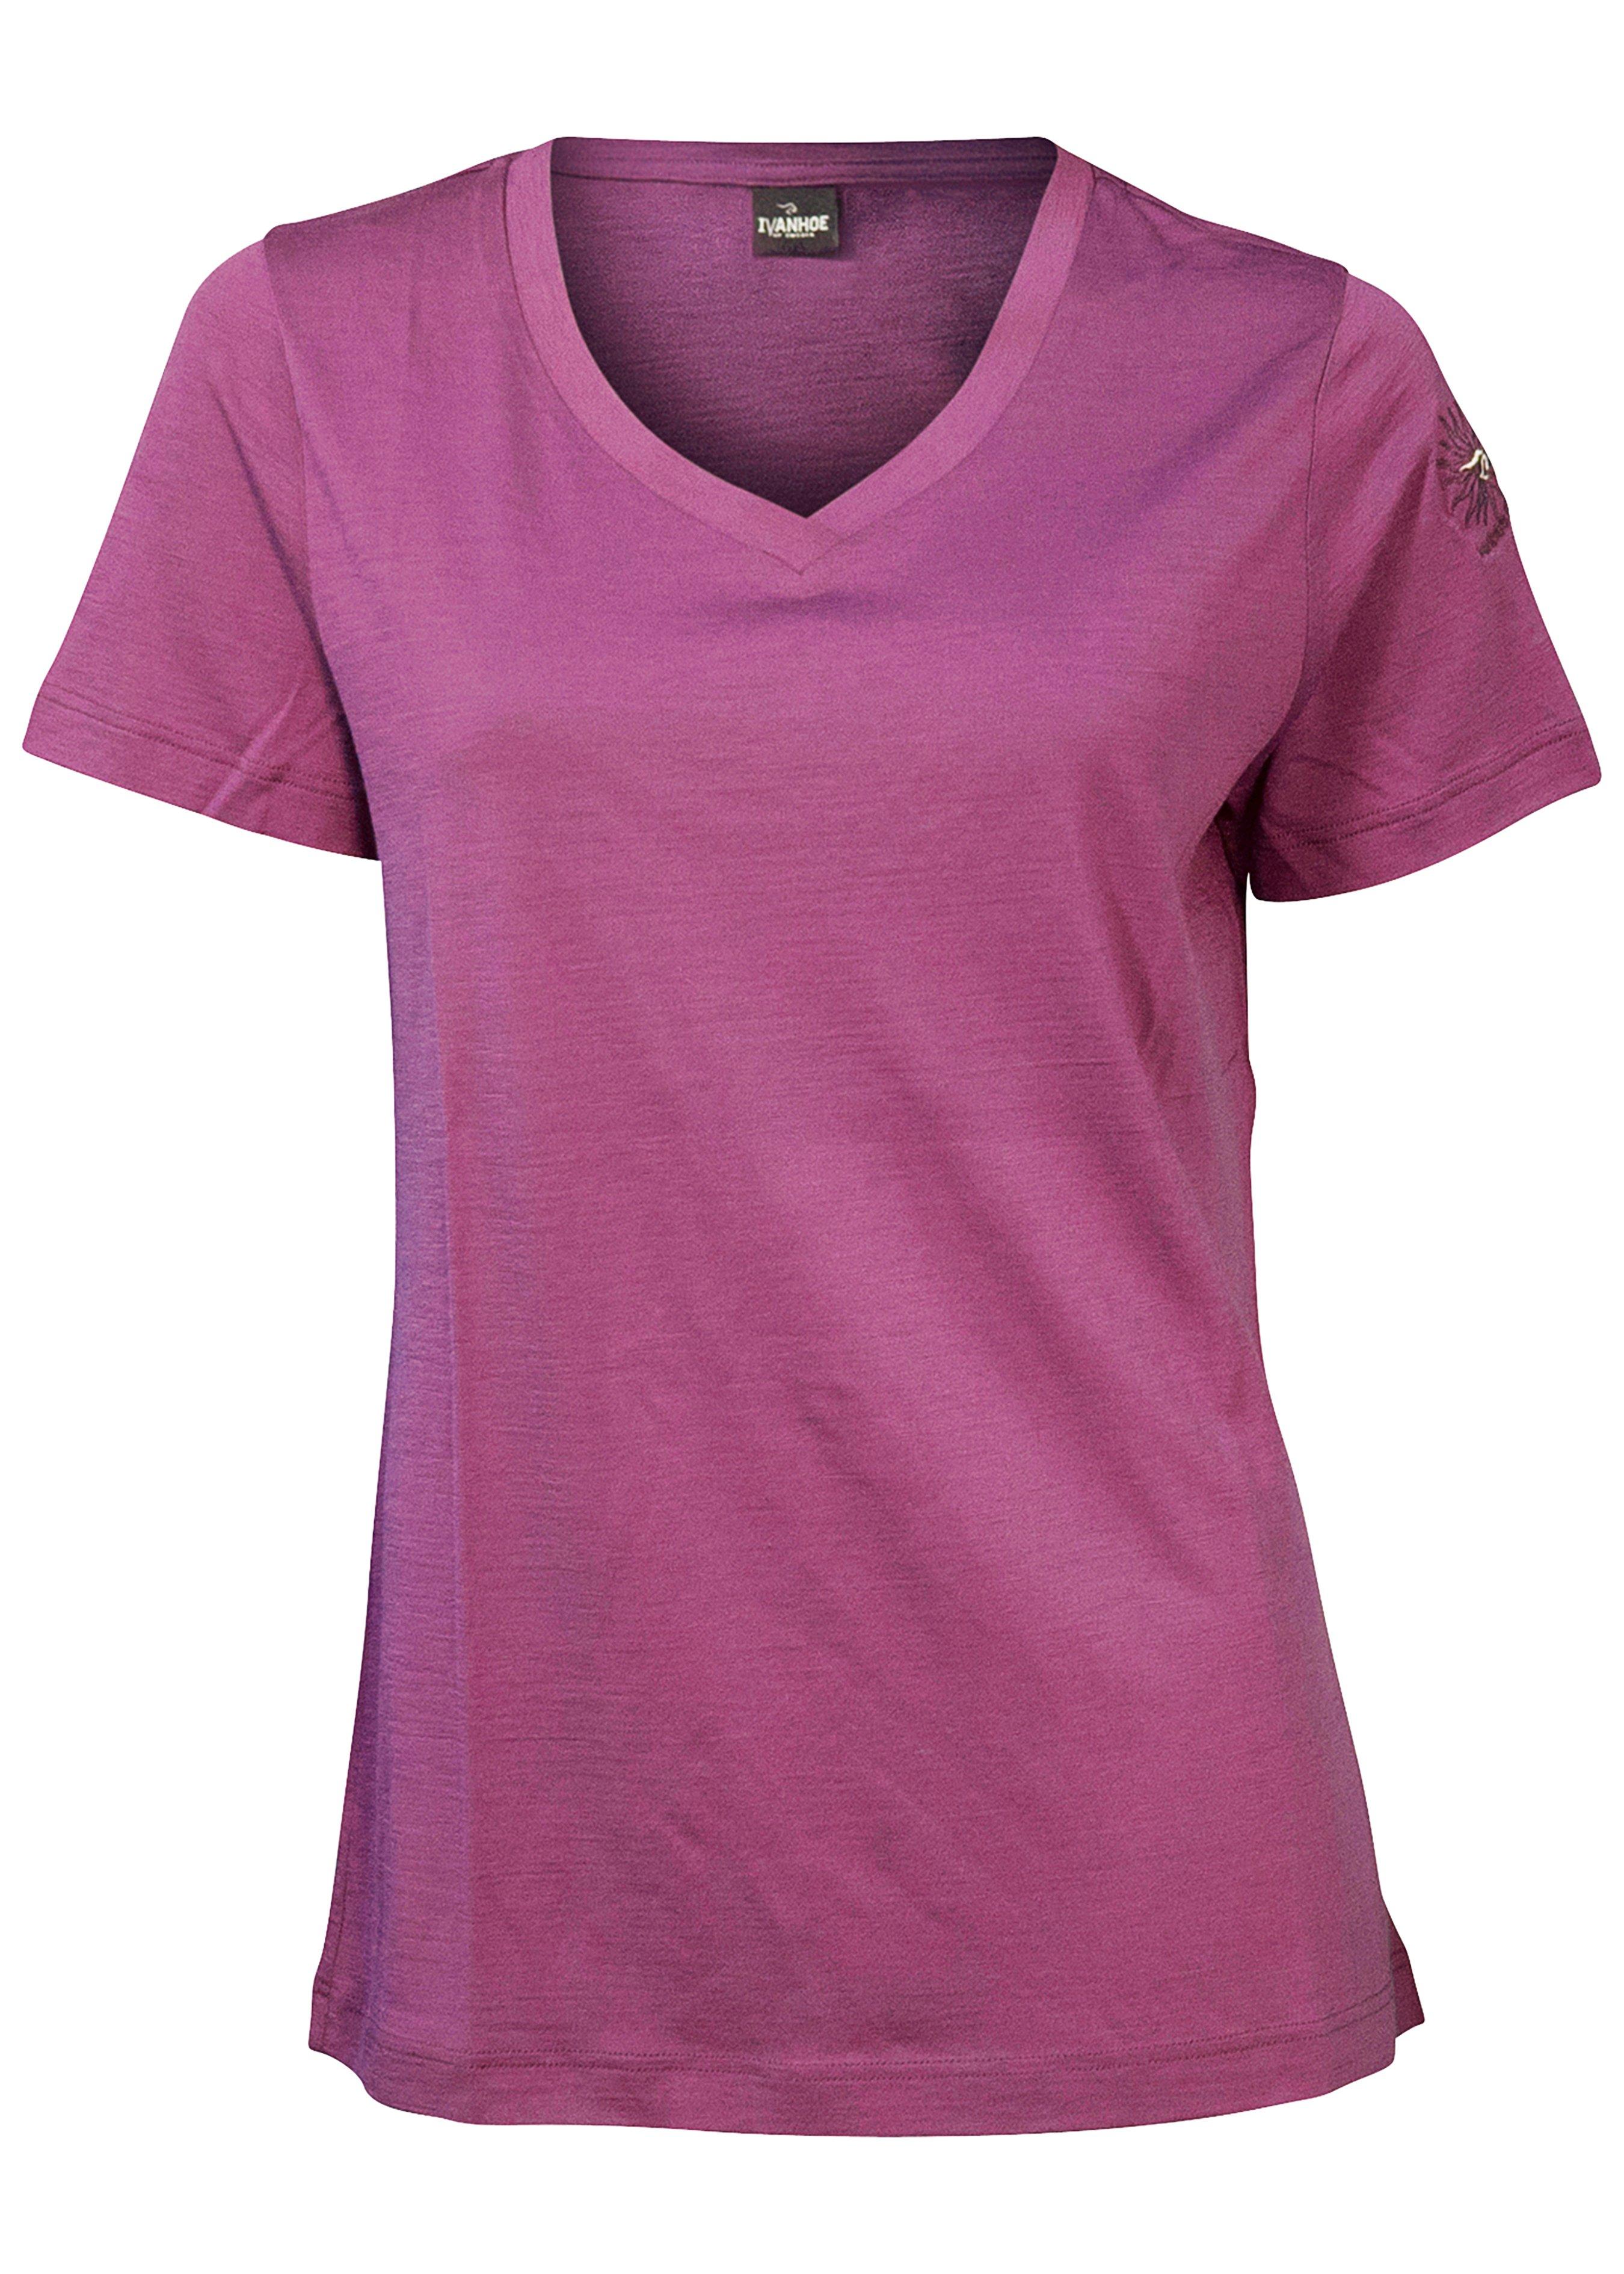 Shirt mérinos pour dames 29094940 1